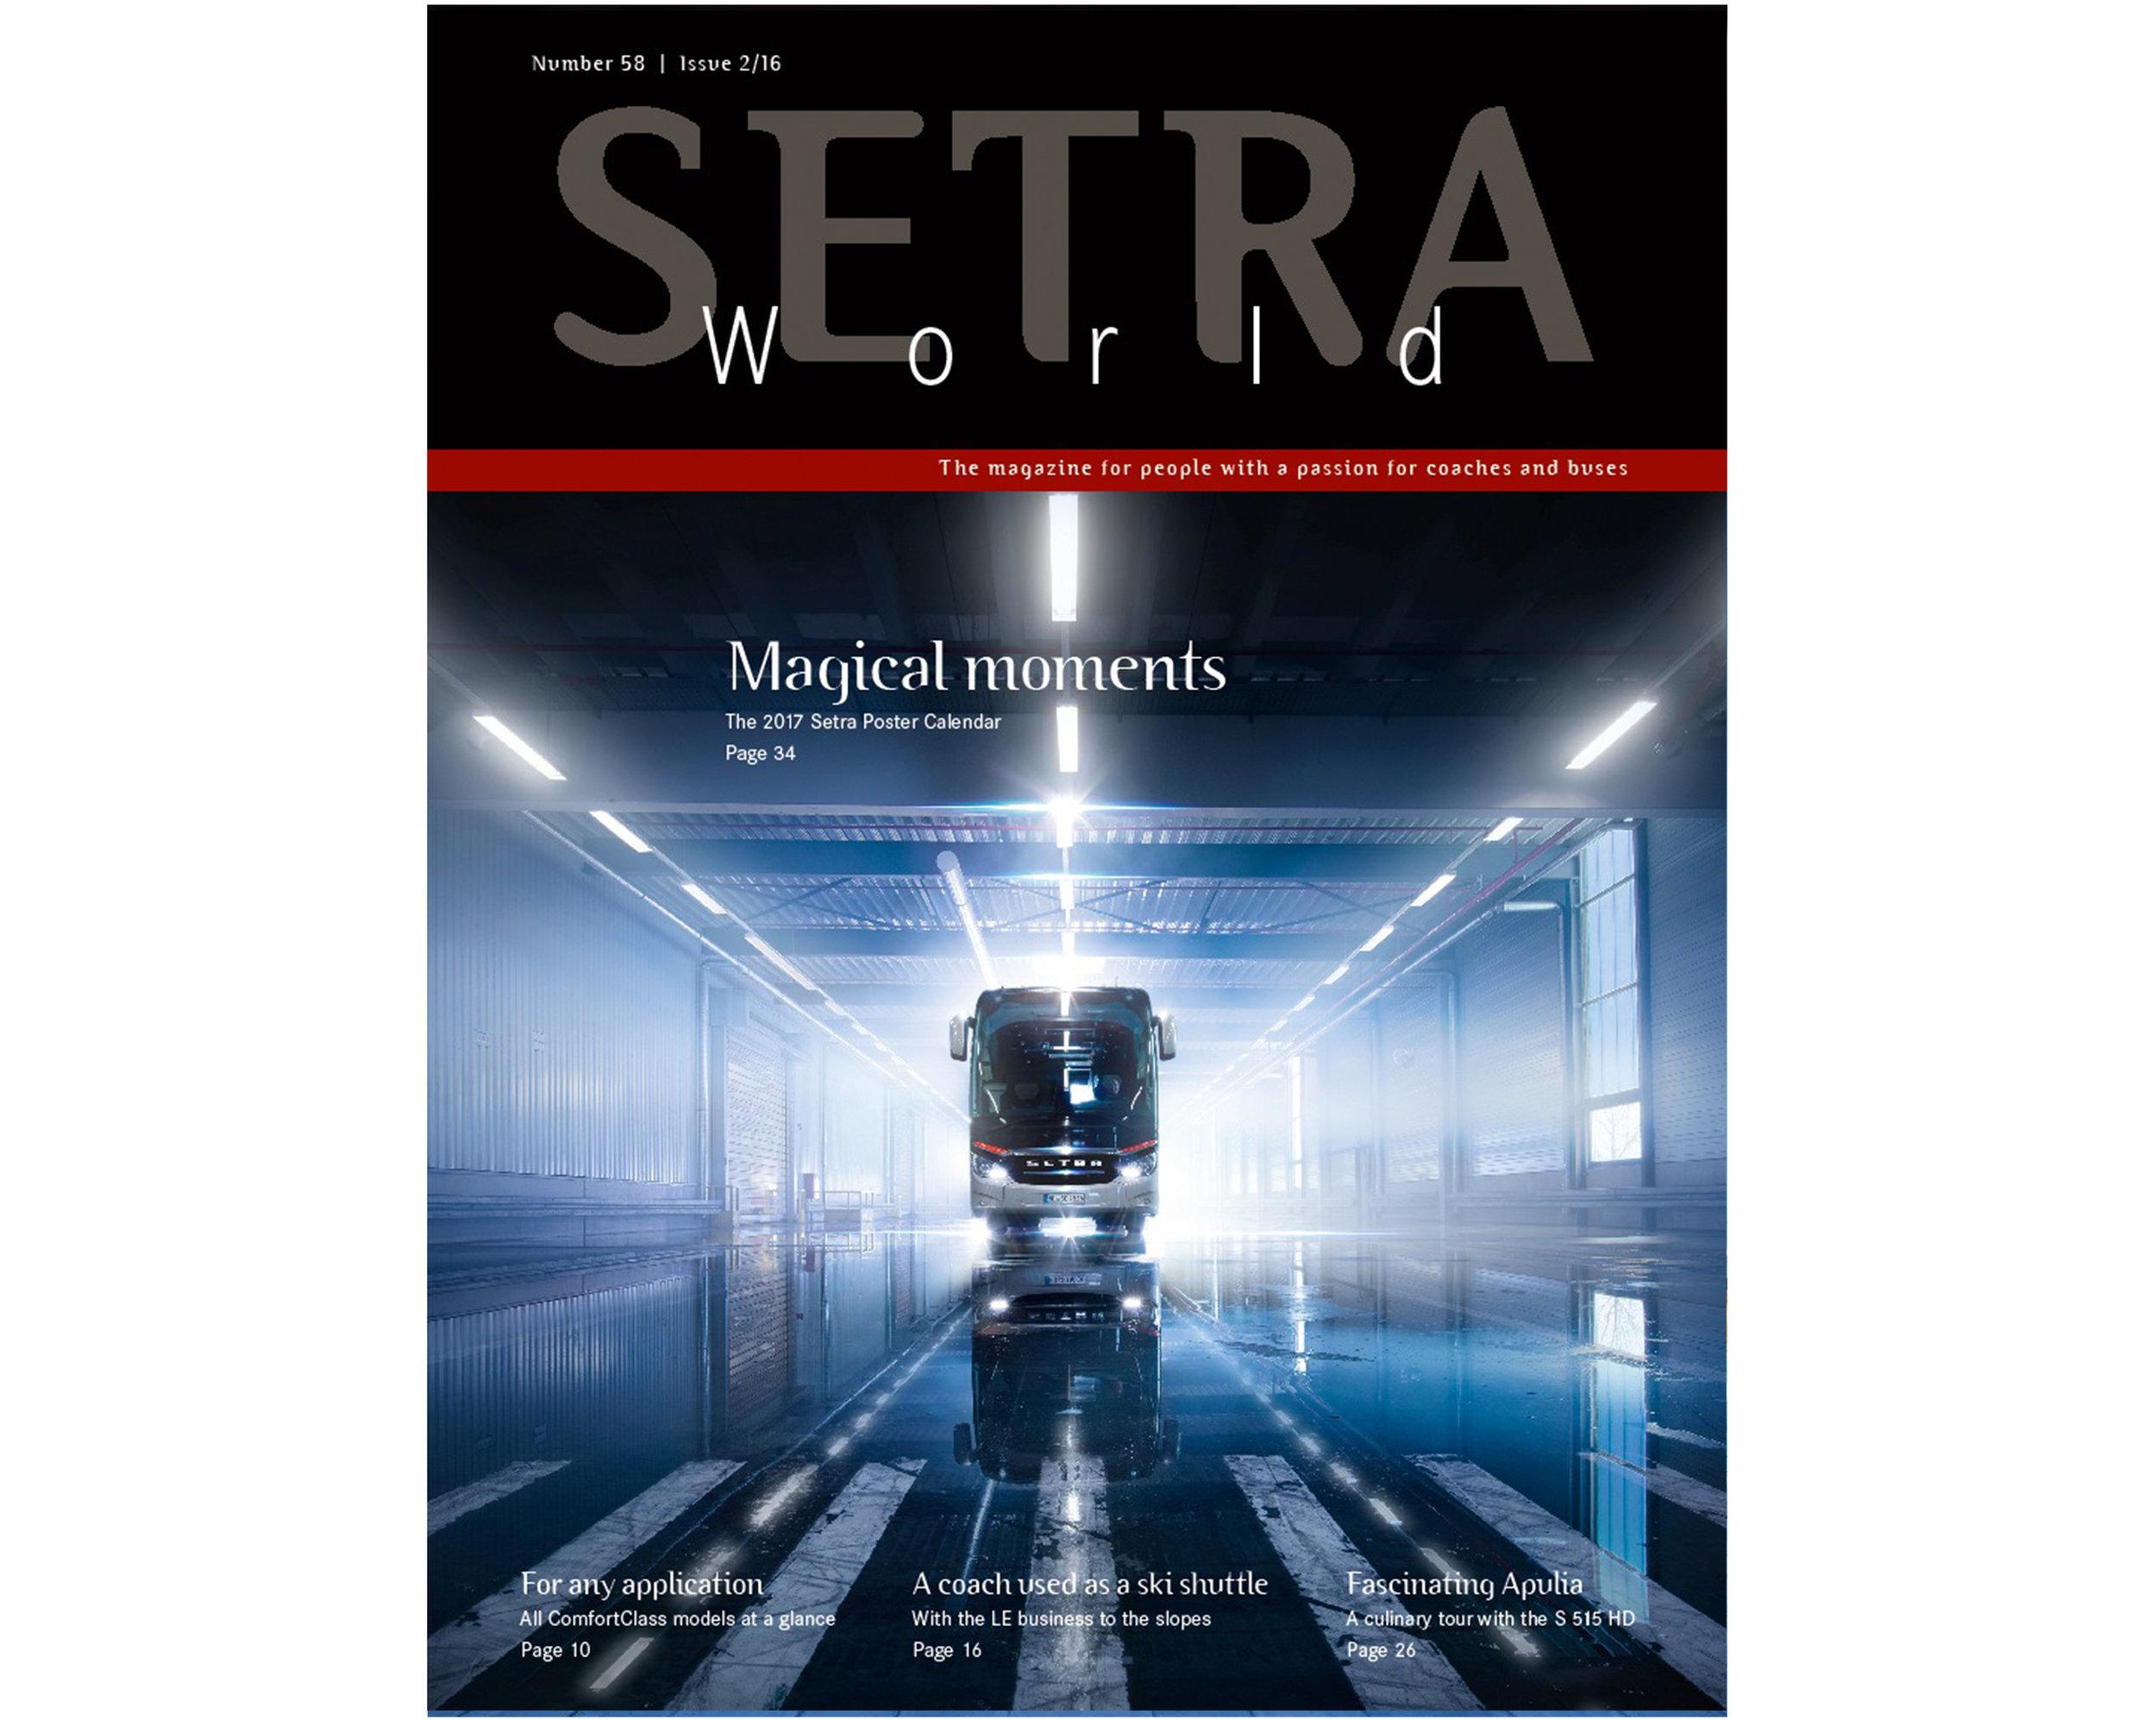 Setra_World_cover_06.jpg